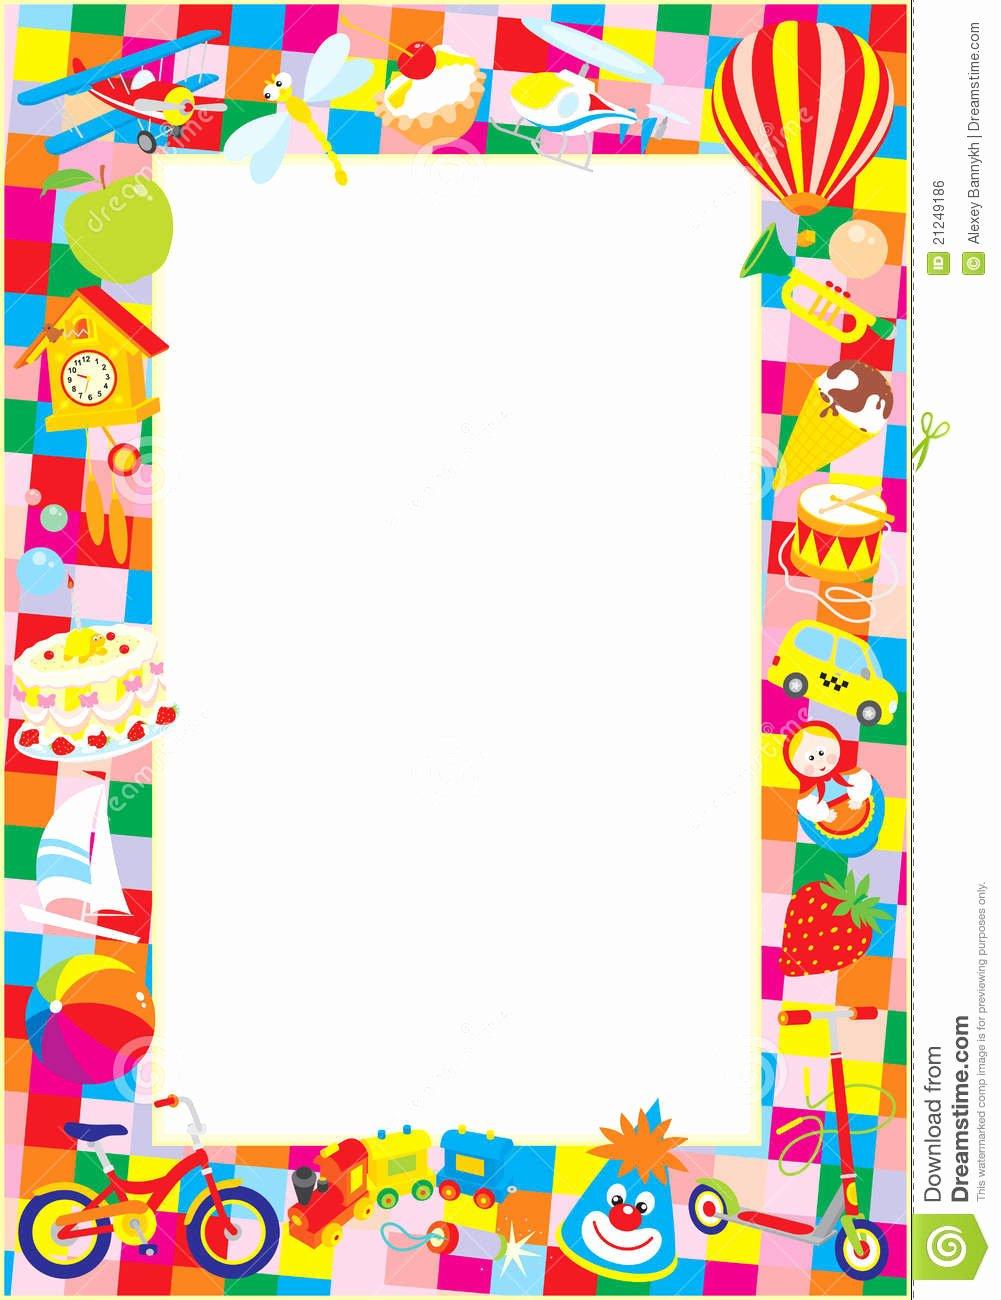 Free School Borders for Word Fresh Preschool Clipart Borders – 101 Clip Art